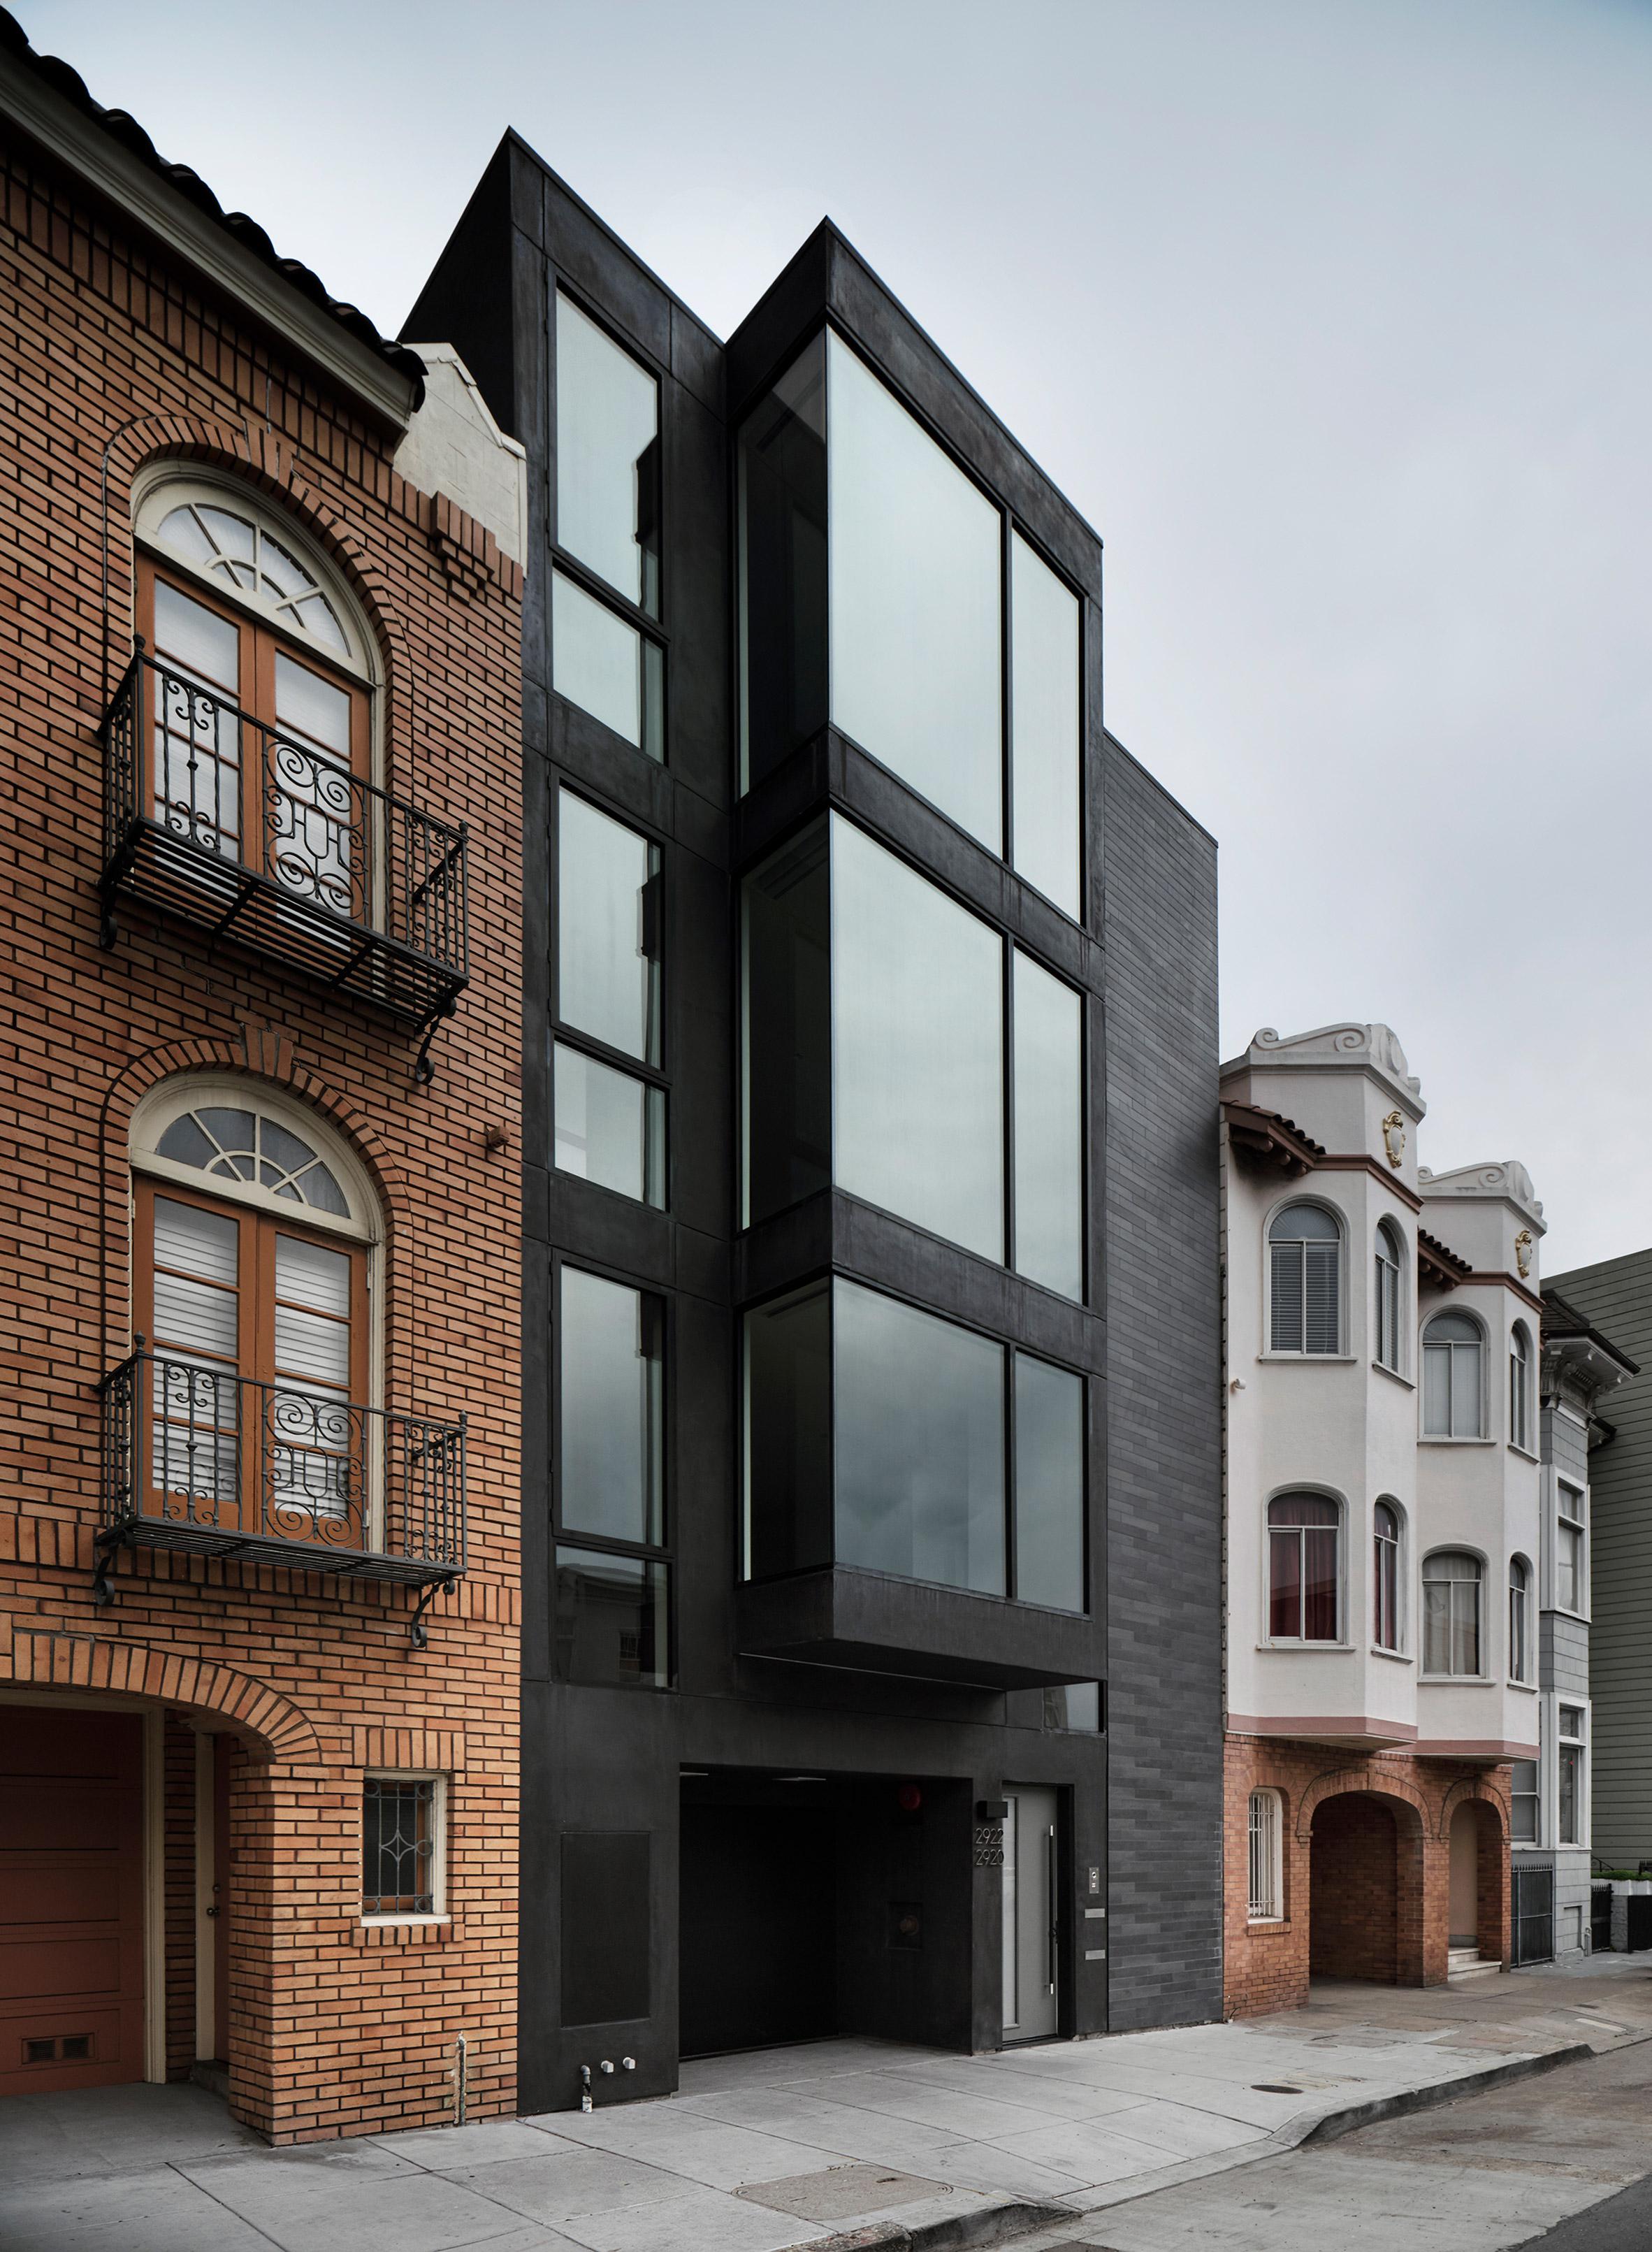 Modern Townhouse Townhouse Designs San Francisco: Michael Hennessey Creates Modern Bay Windows For San Francisco Townhouse